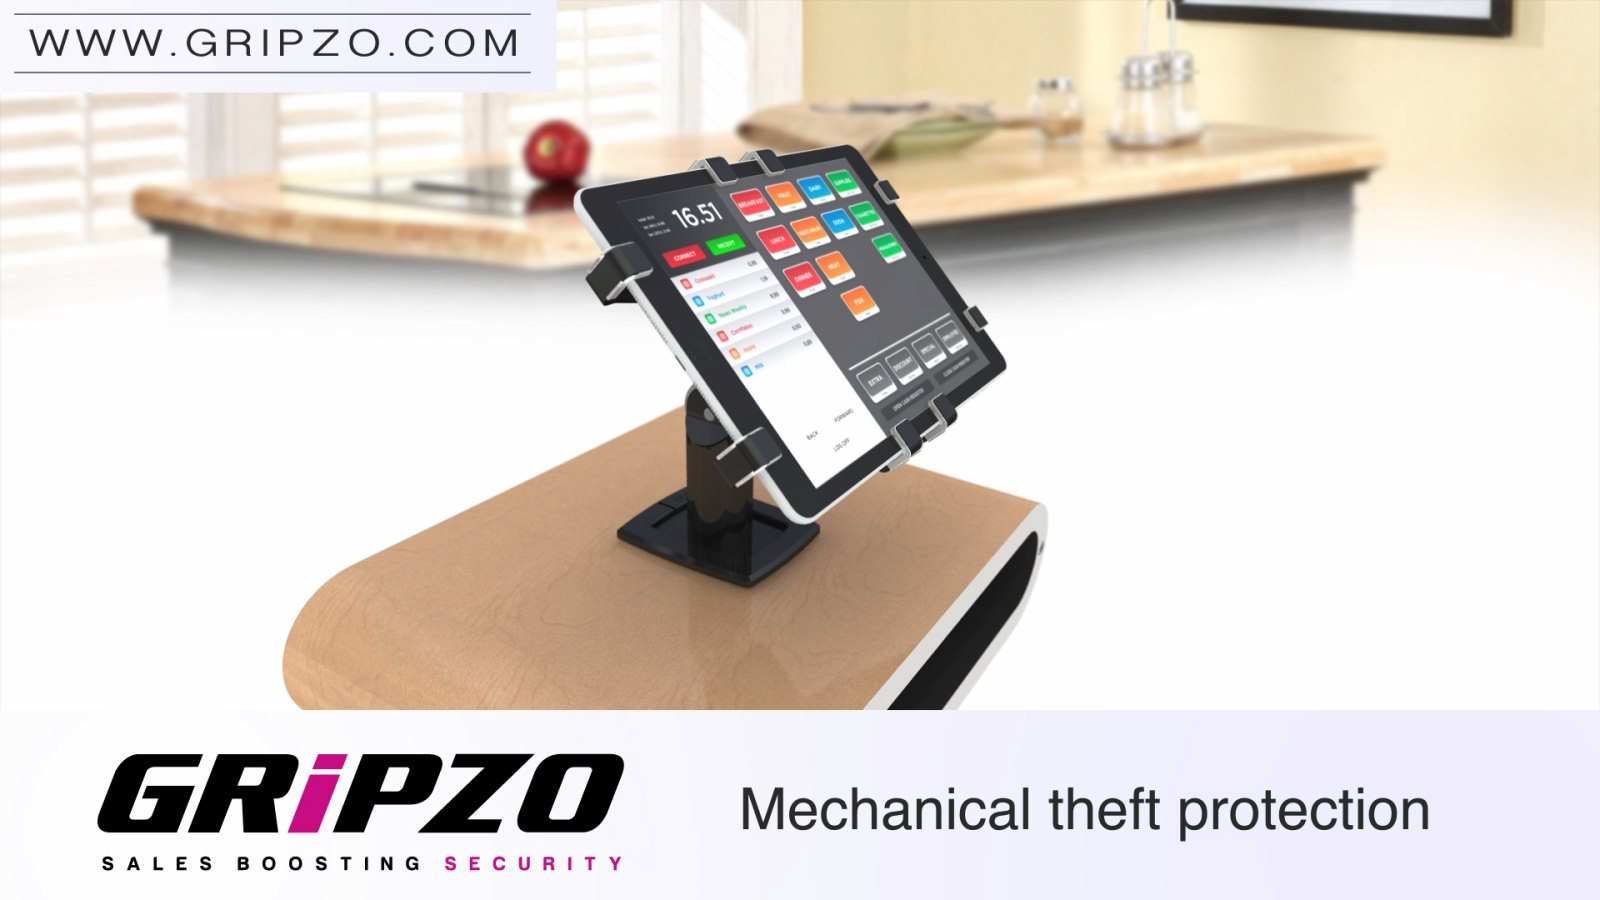 gripzo-security-fixture-image-0-00-07-21.jpg